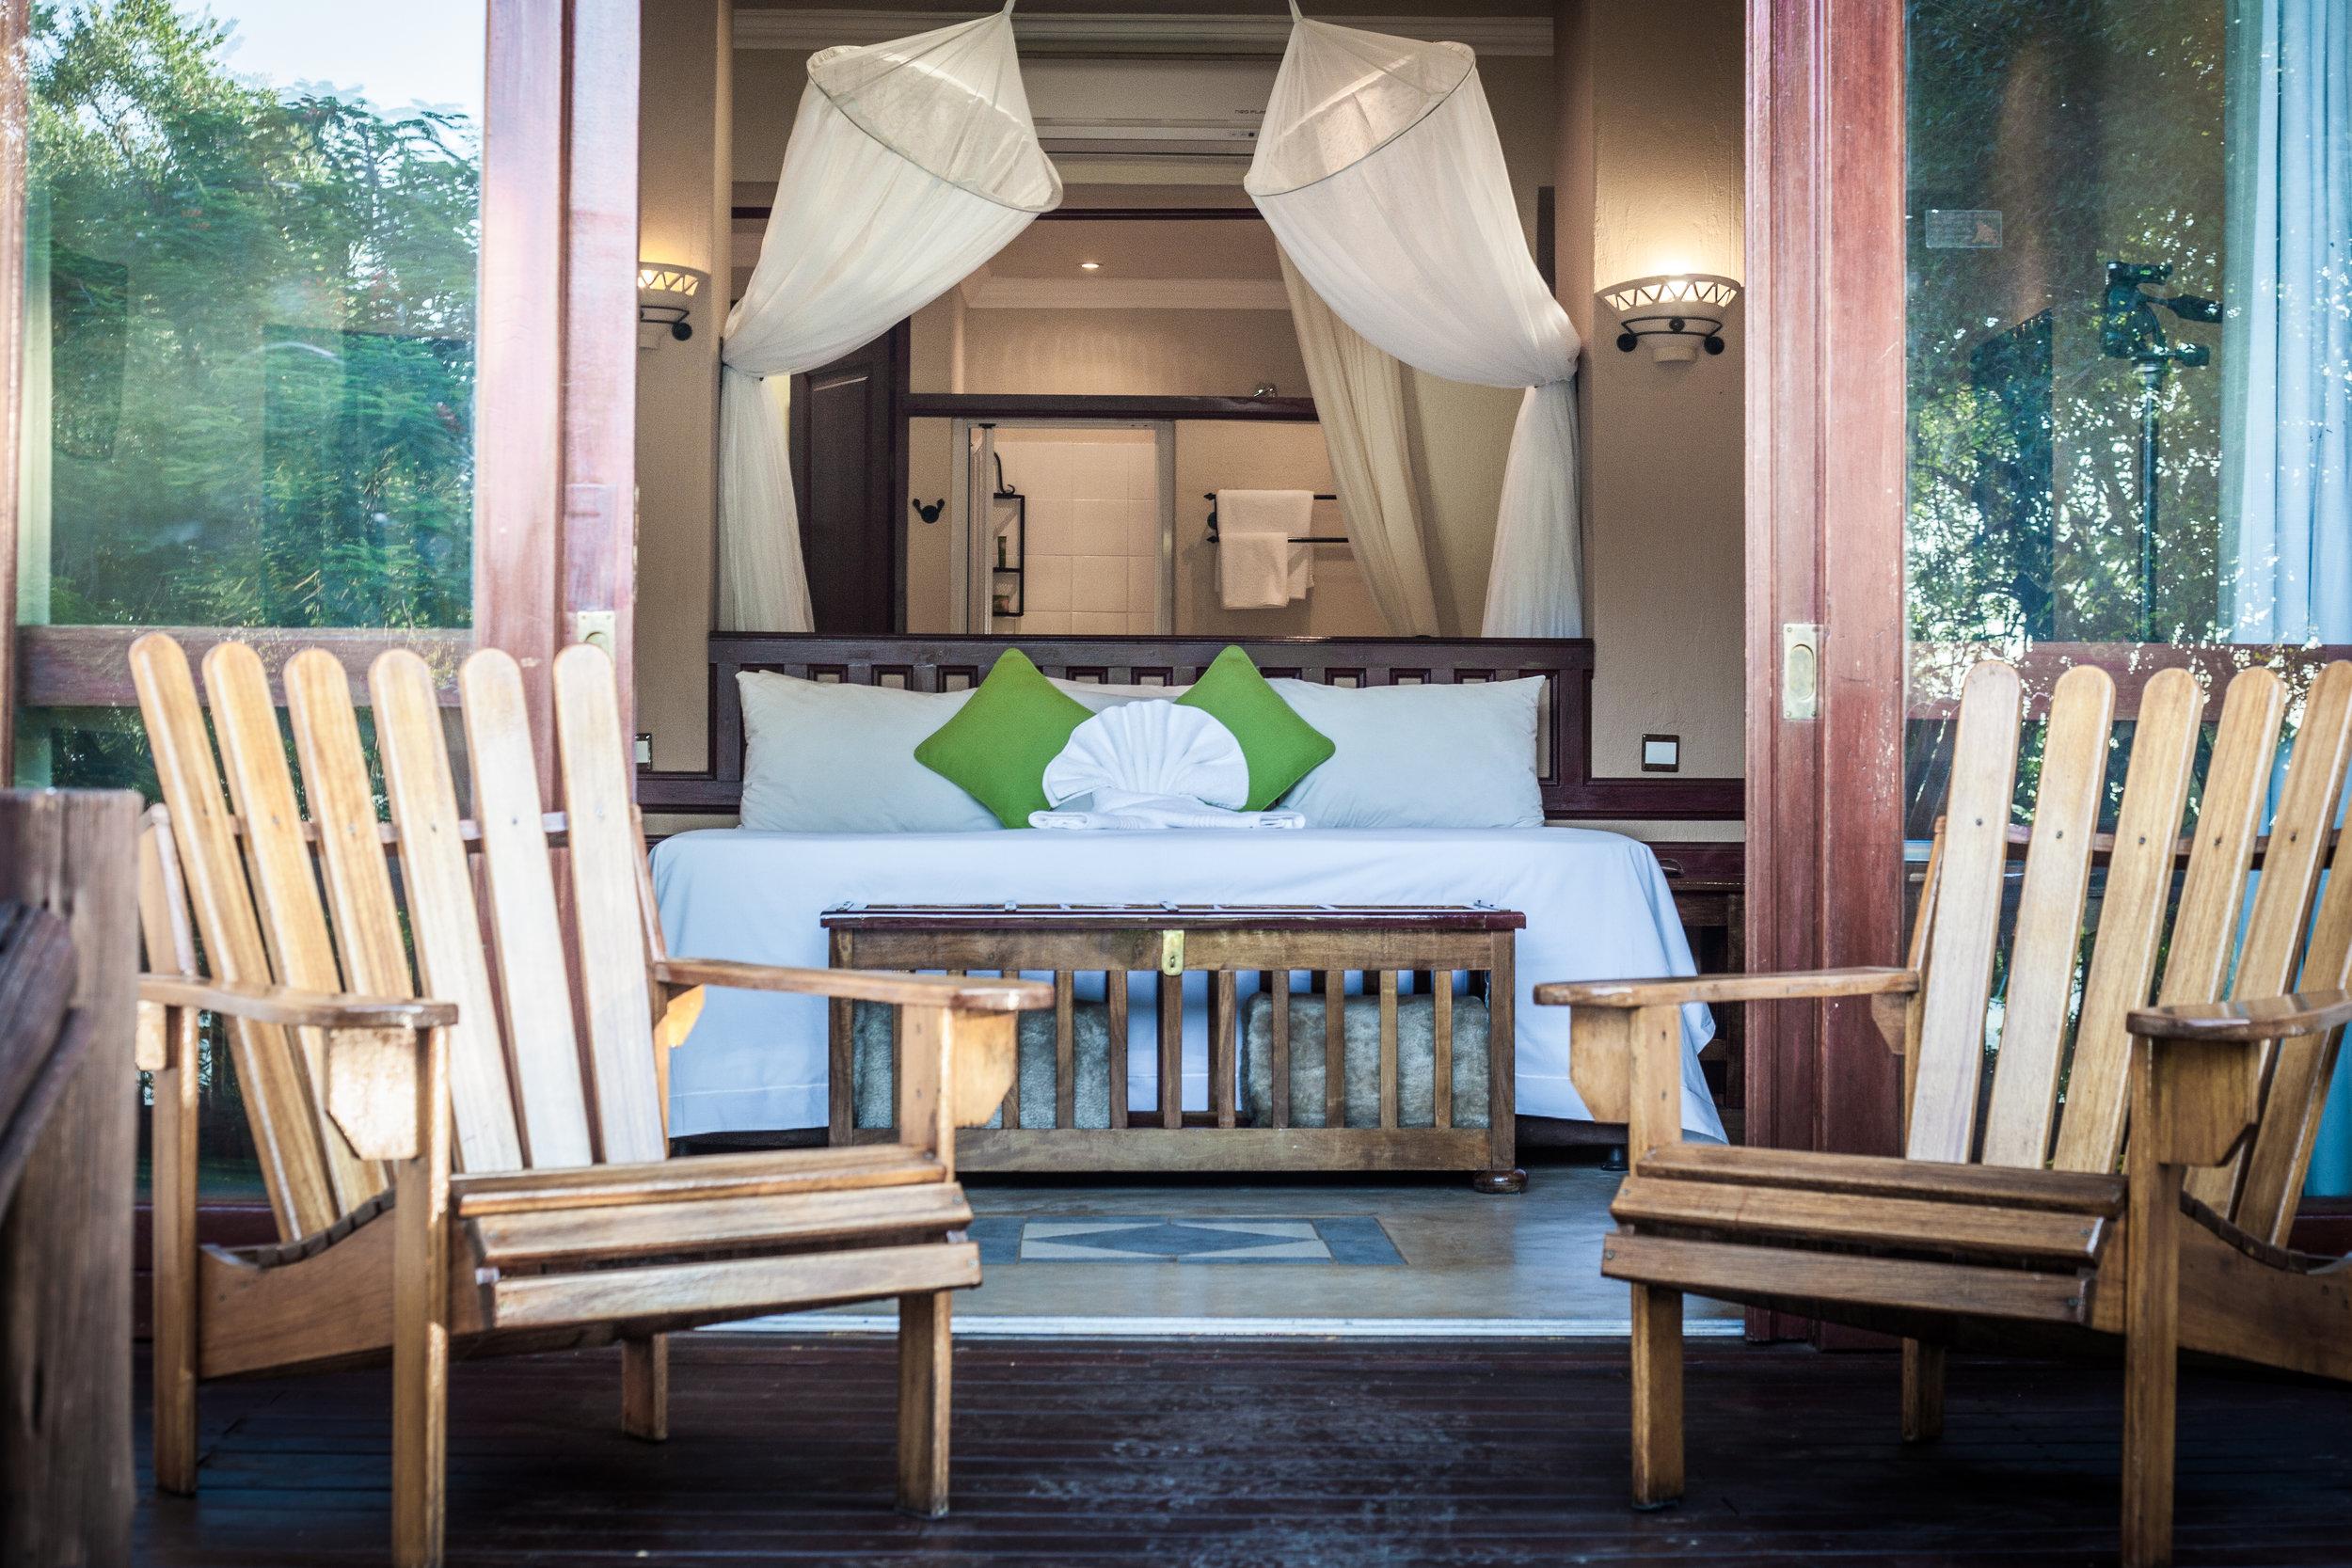 top chobe camps & lodges - chobe safari lodge